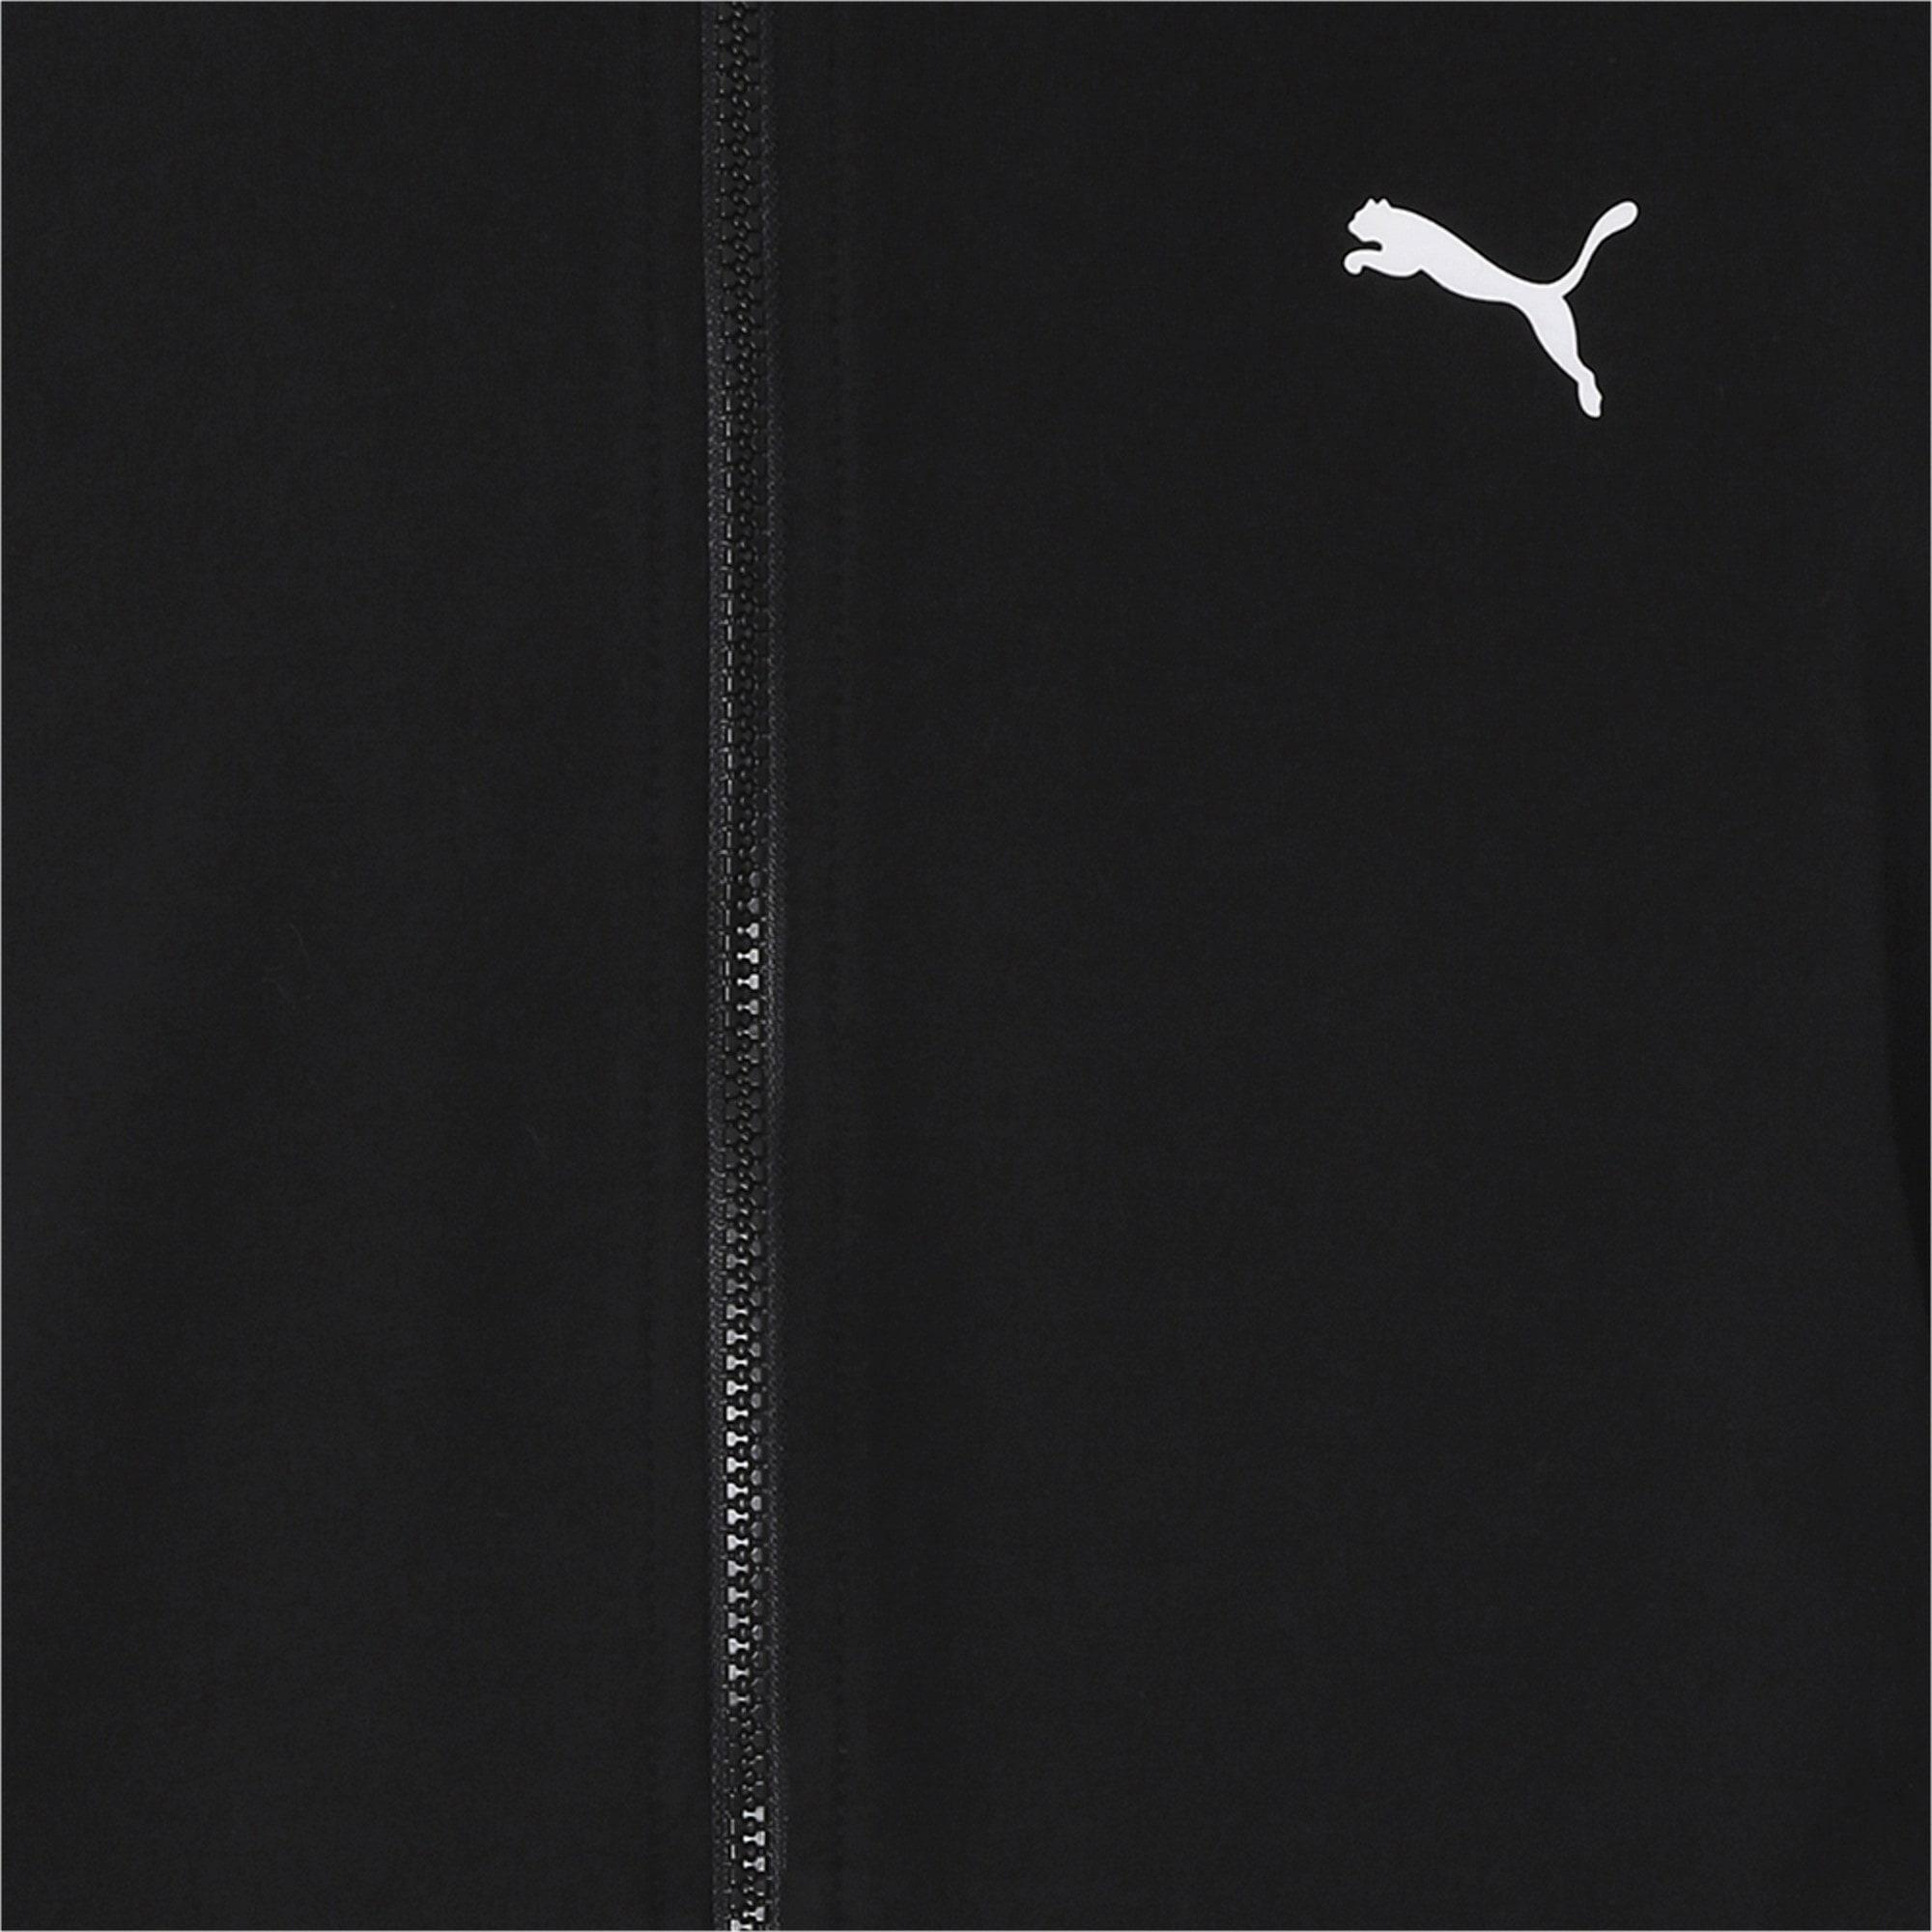 Thumbnail 6 of one8 Men's Knitted Track Jacket, Puma Black, medium-IND